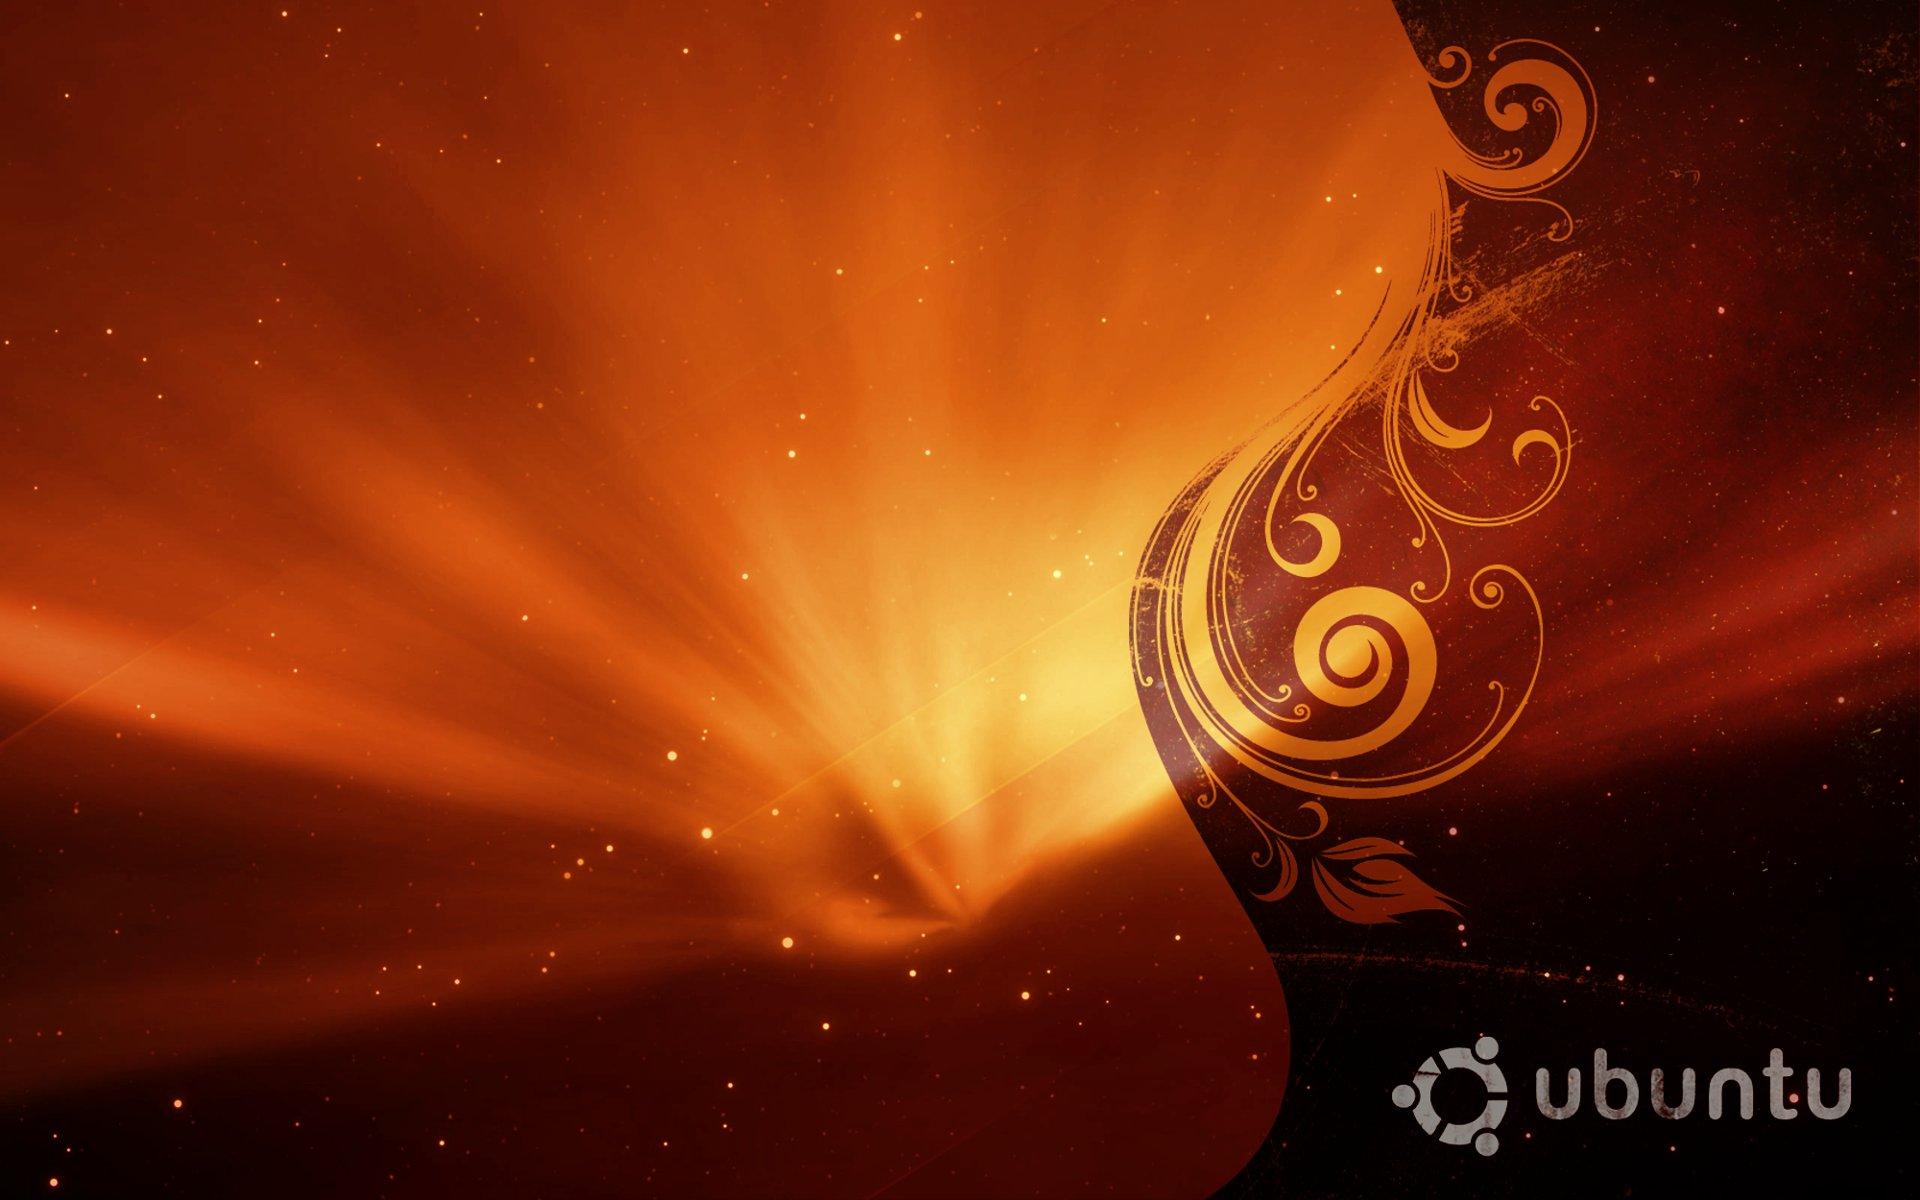 Best Looking Wallpapers For Ubuntu 1920x1200